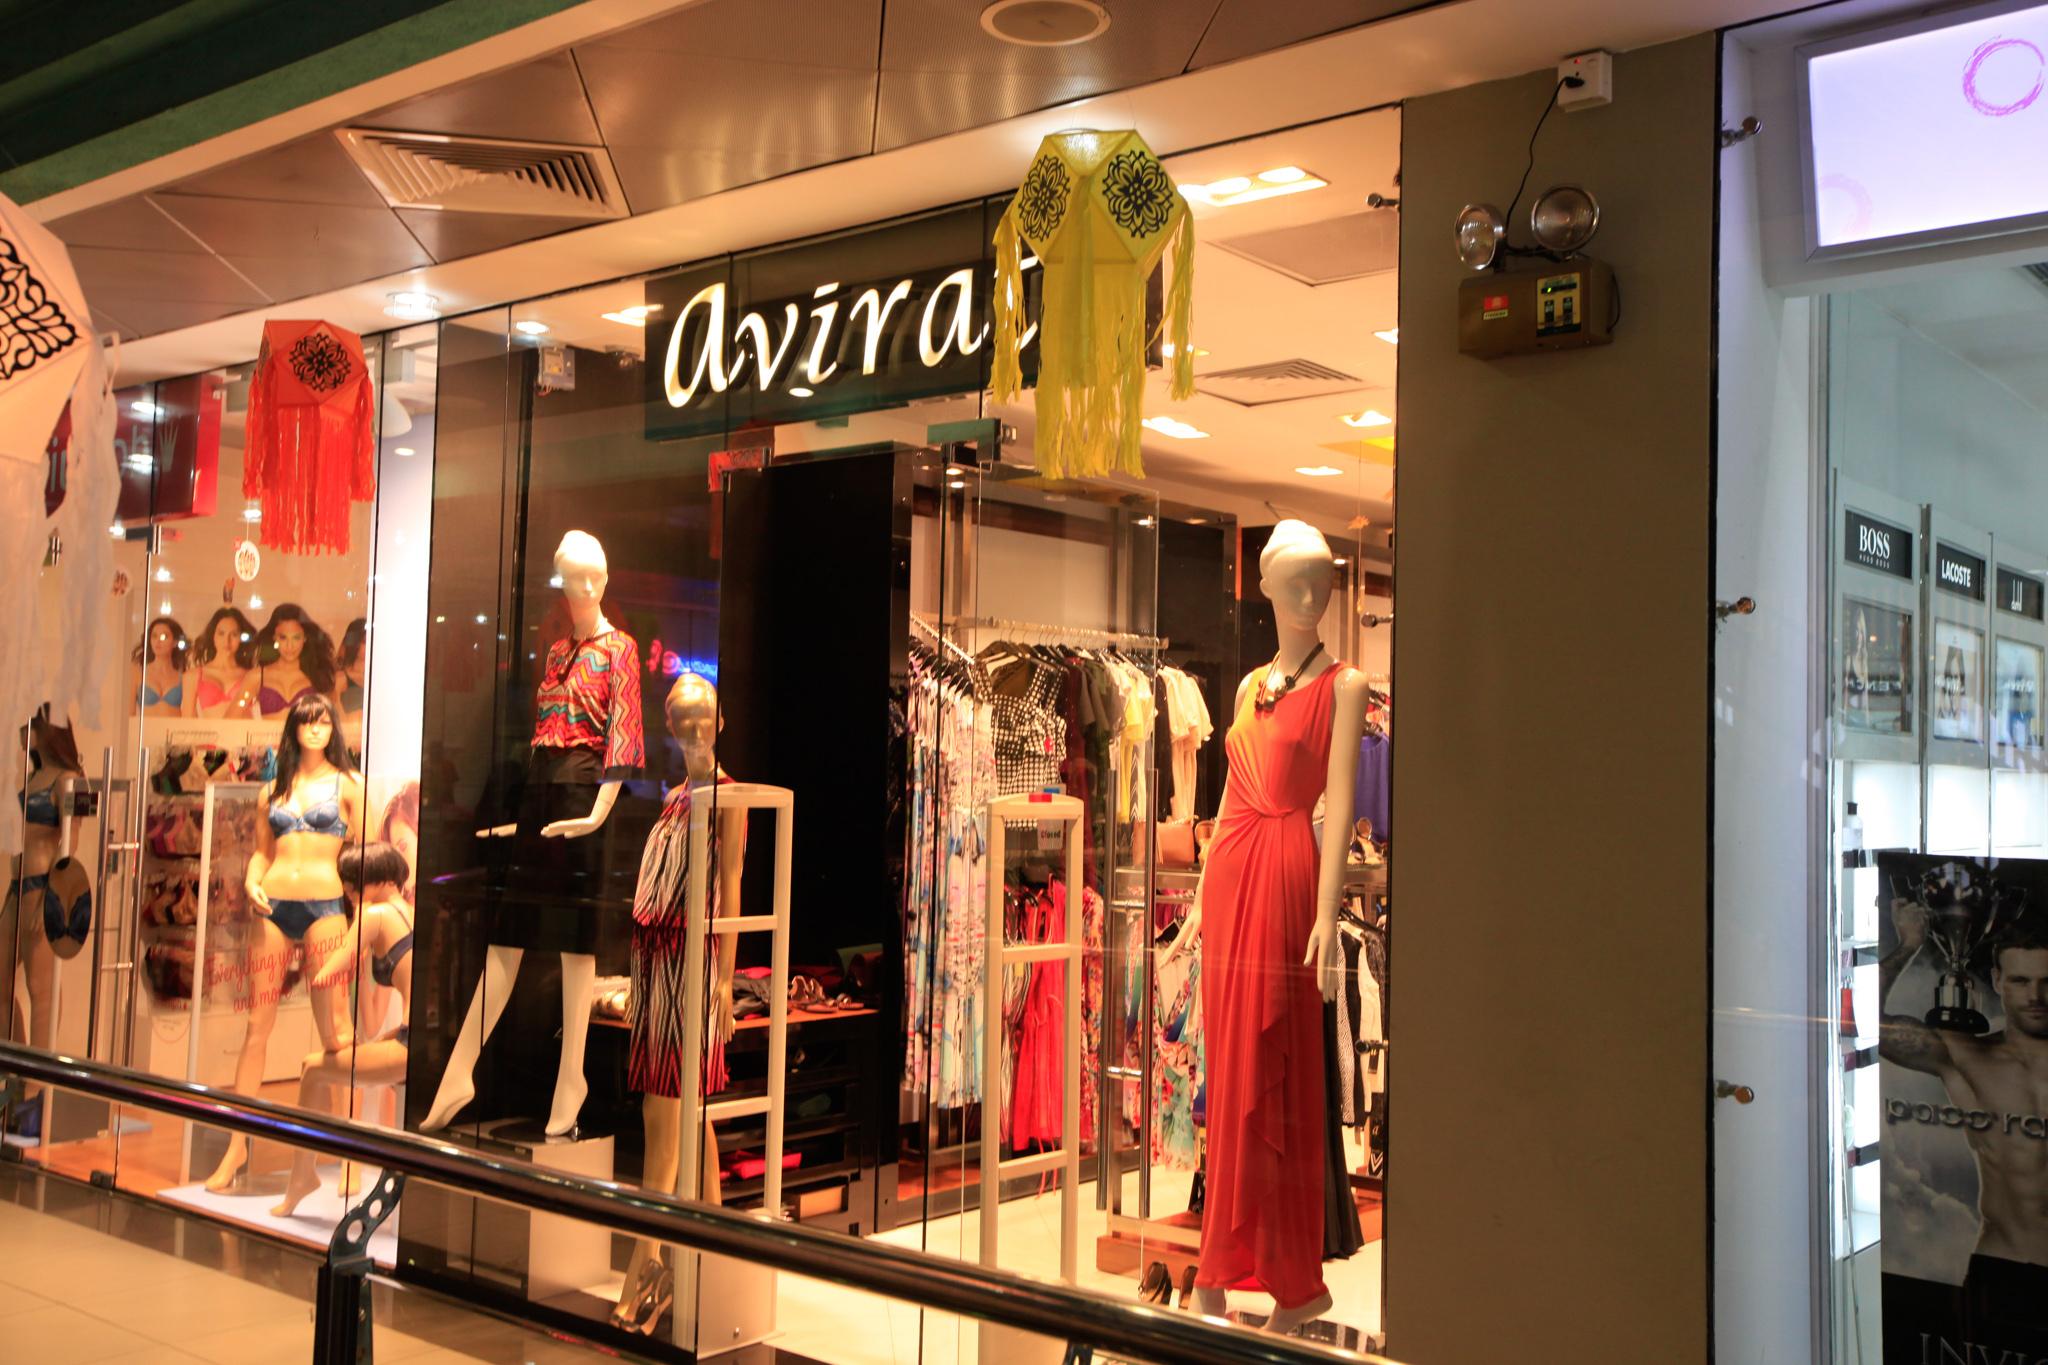 cfd2f96cad Fashion Express Store Locator - LocalStore 60